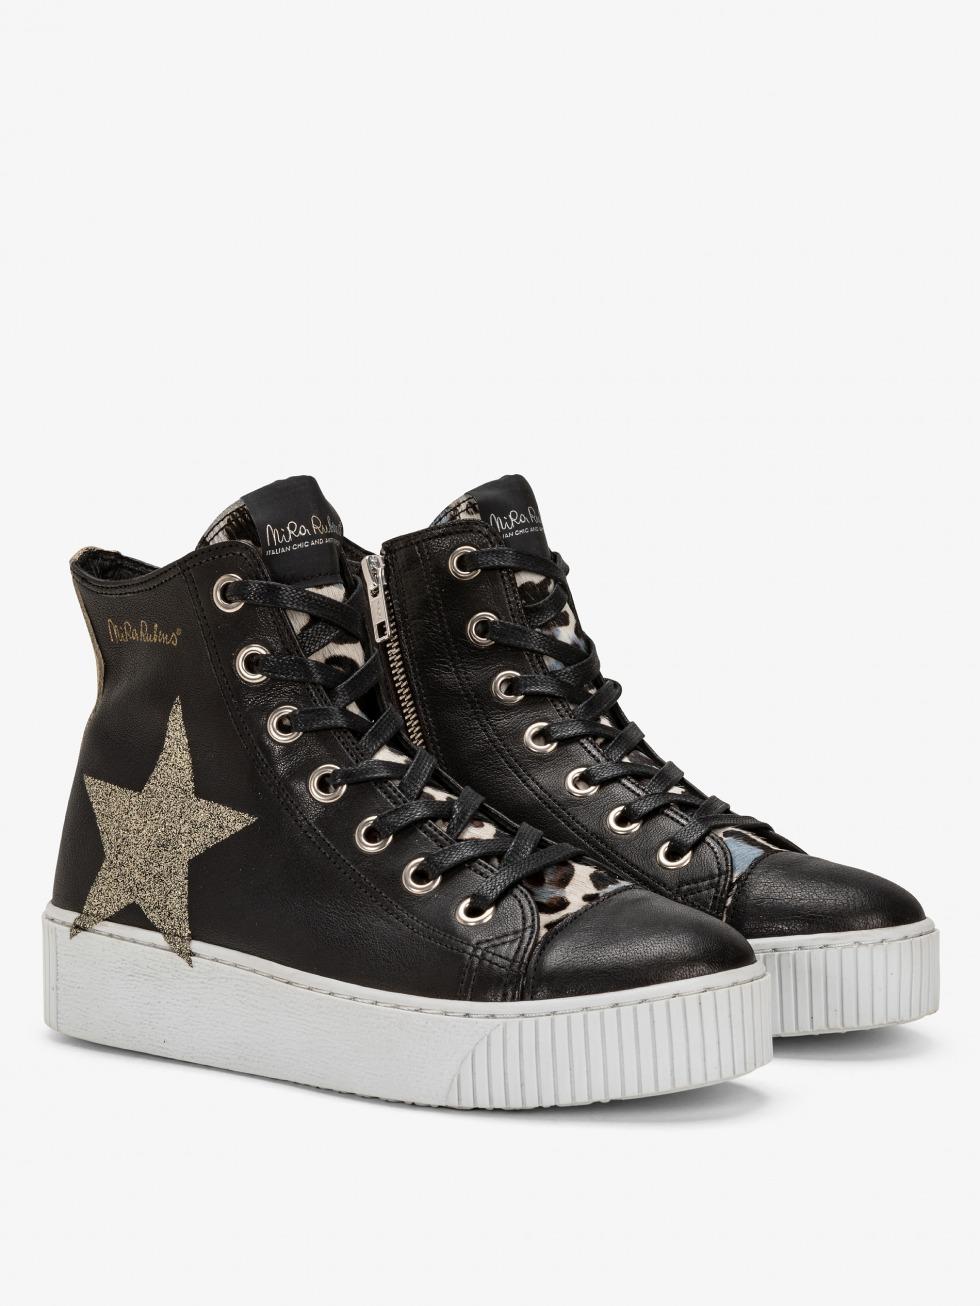 Long Island Sneakers - Jungle Dark Star